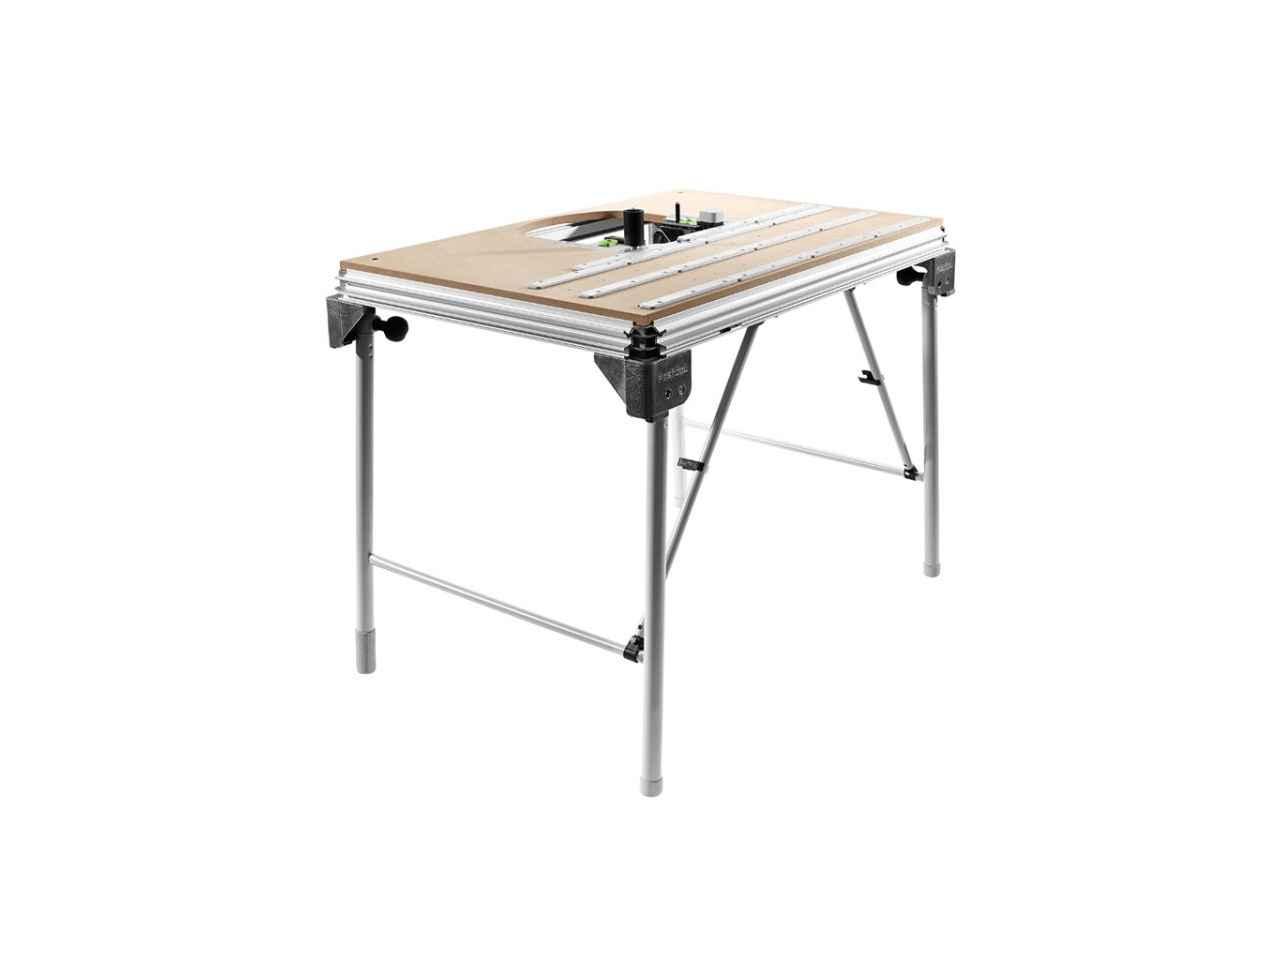 Festool 707126 multif table mft 3 conturo for Table festool